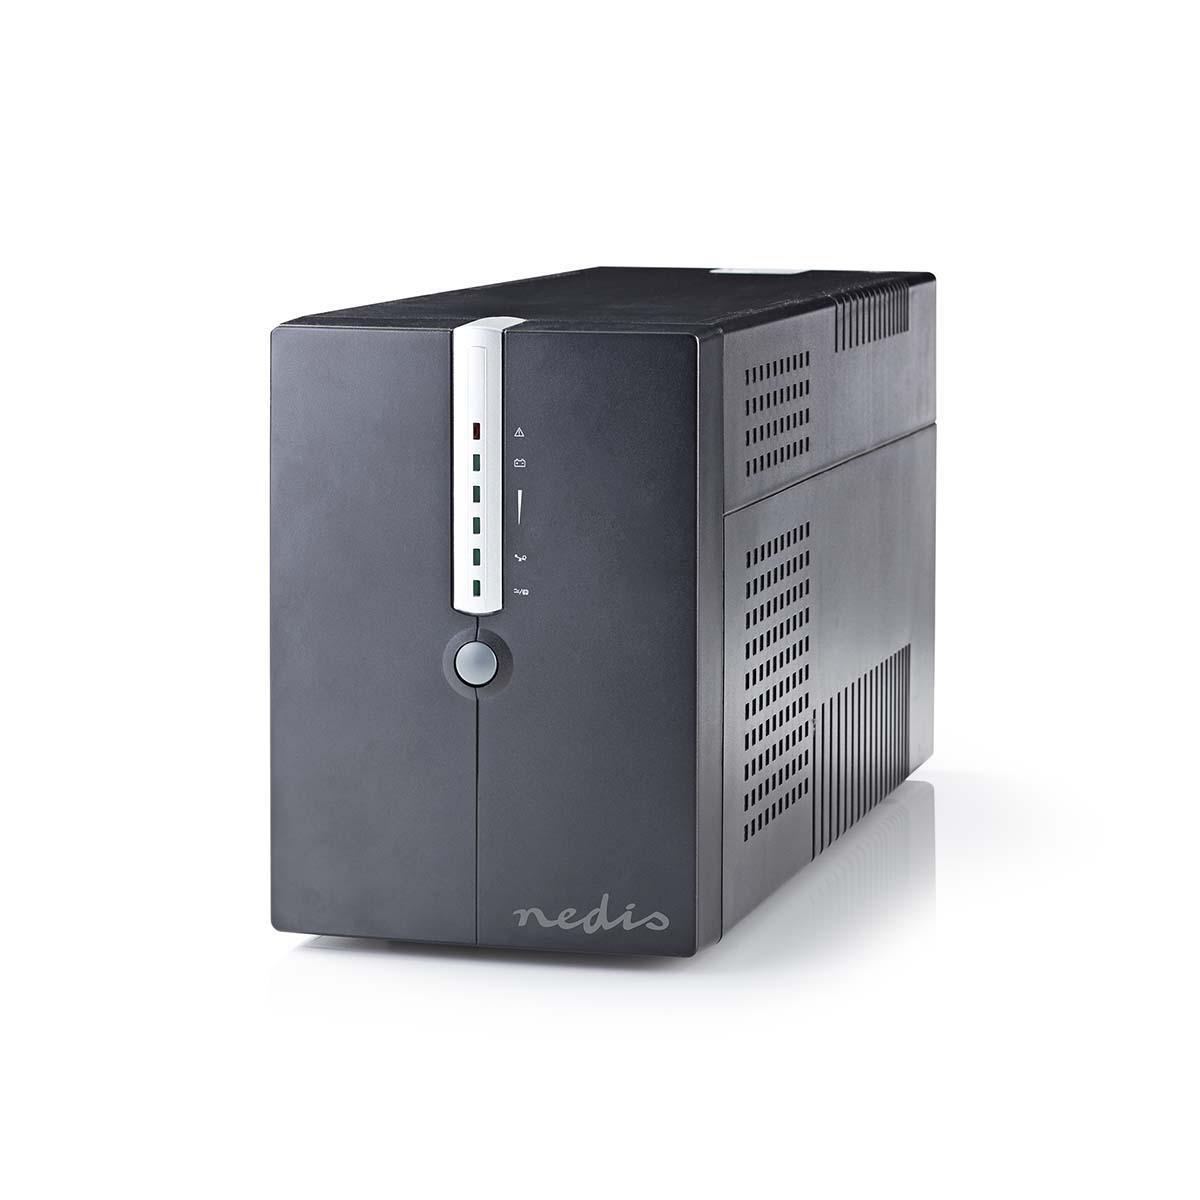 UPS / Emergency power supply 2000VA / 1200 Watt, 4 plug connections